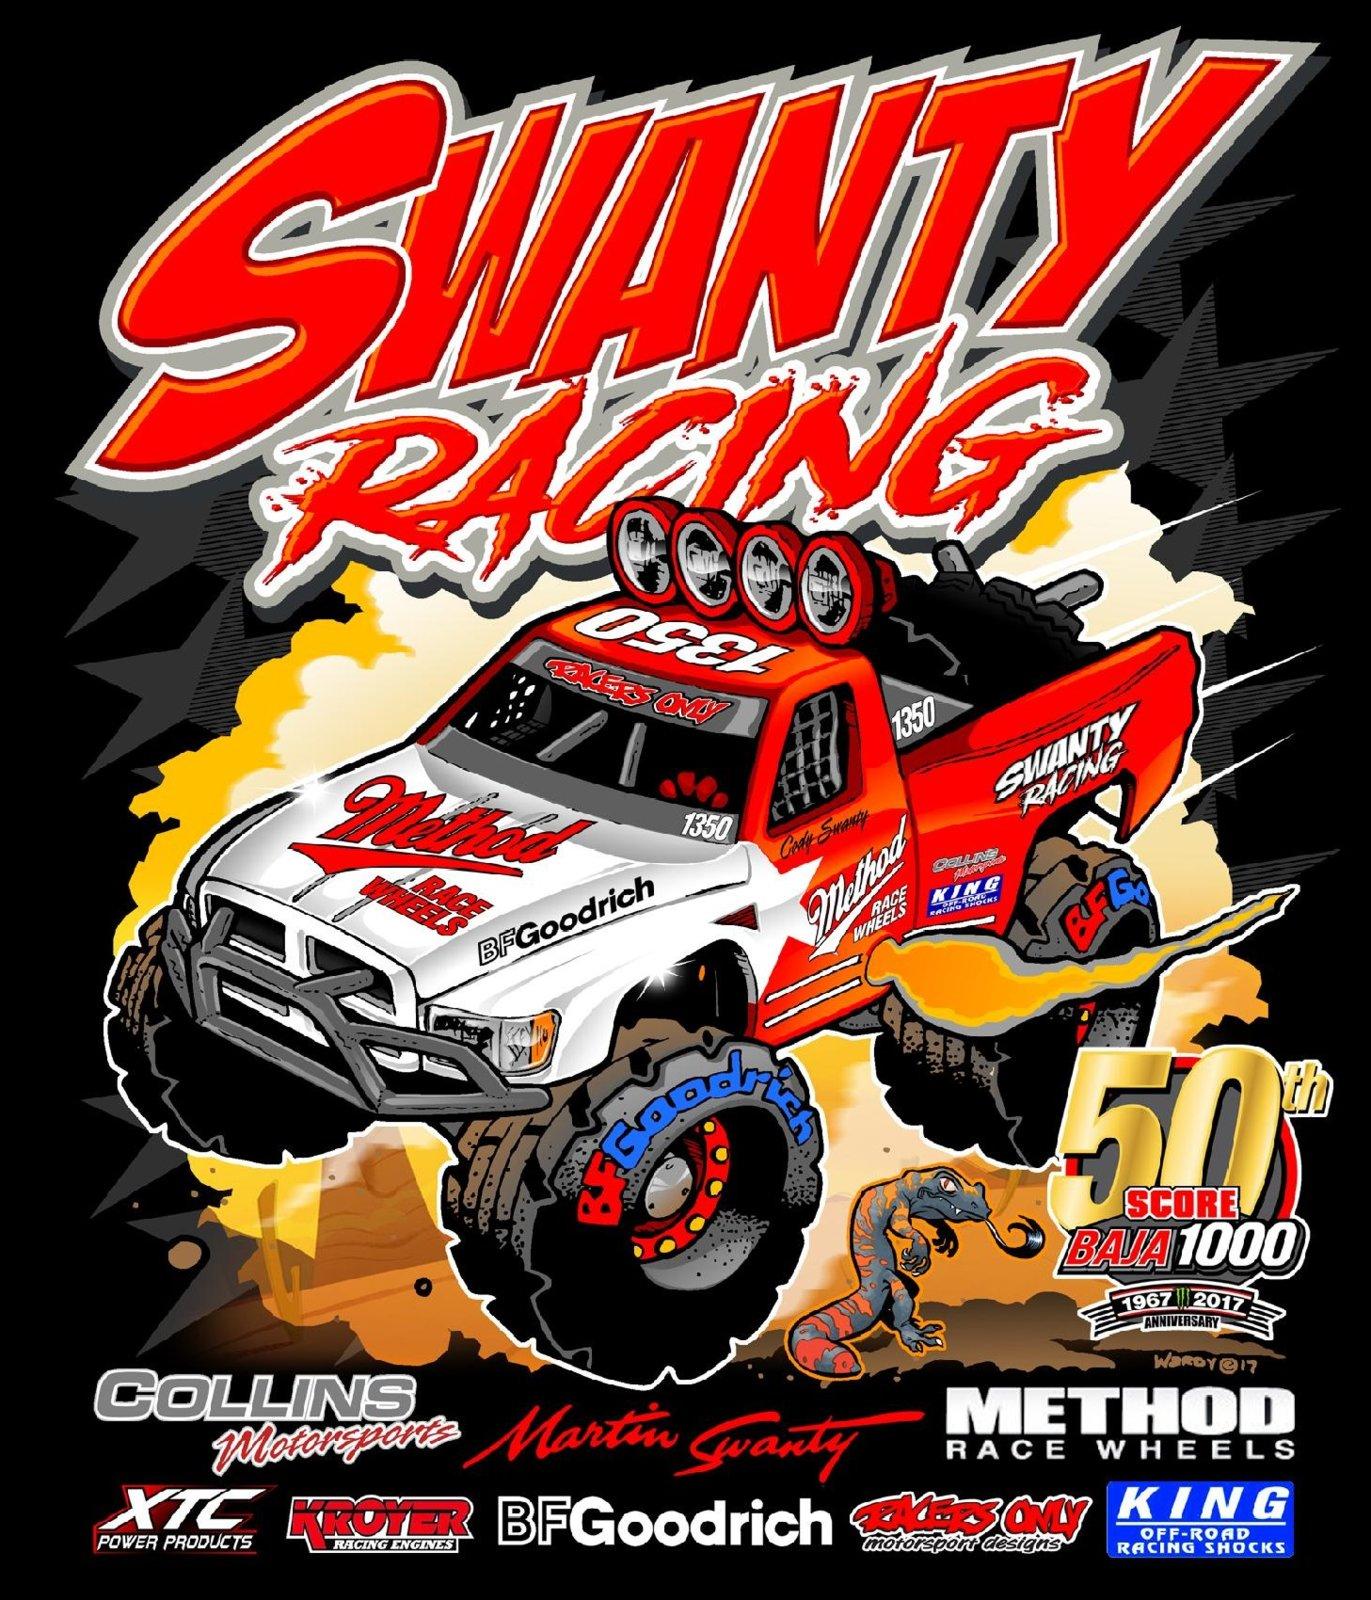 Swanty Racing v2 - Copy (2).jpg